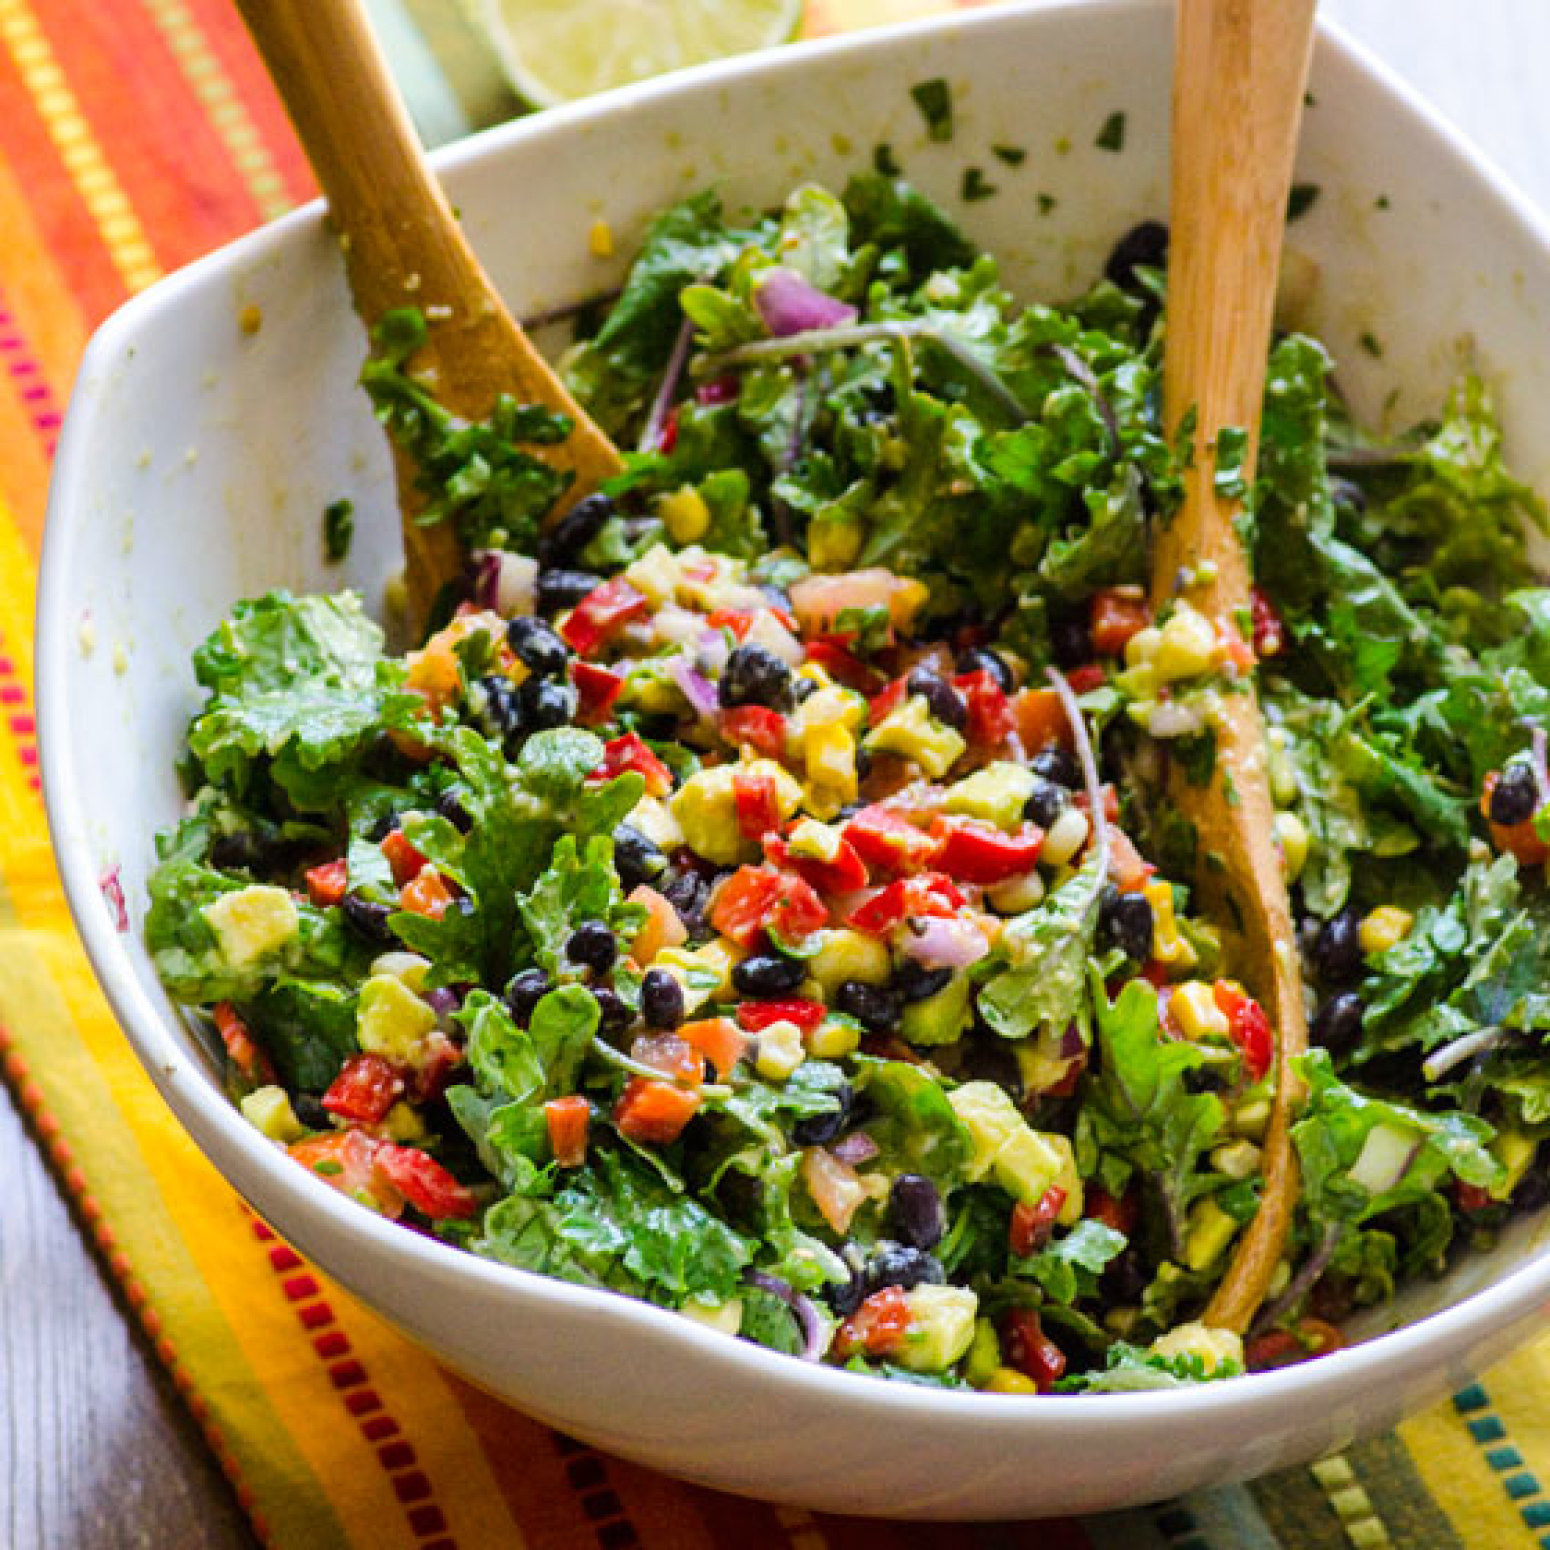 Healthy Recipes With Kale  Healthy Creamy Mexican Kale Salad Recipe